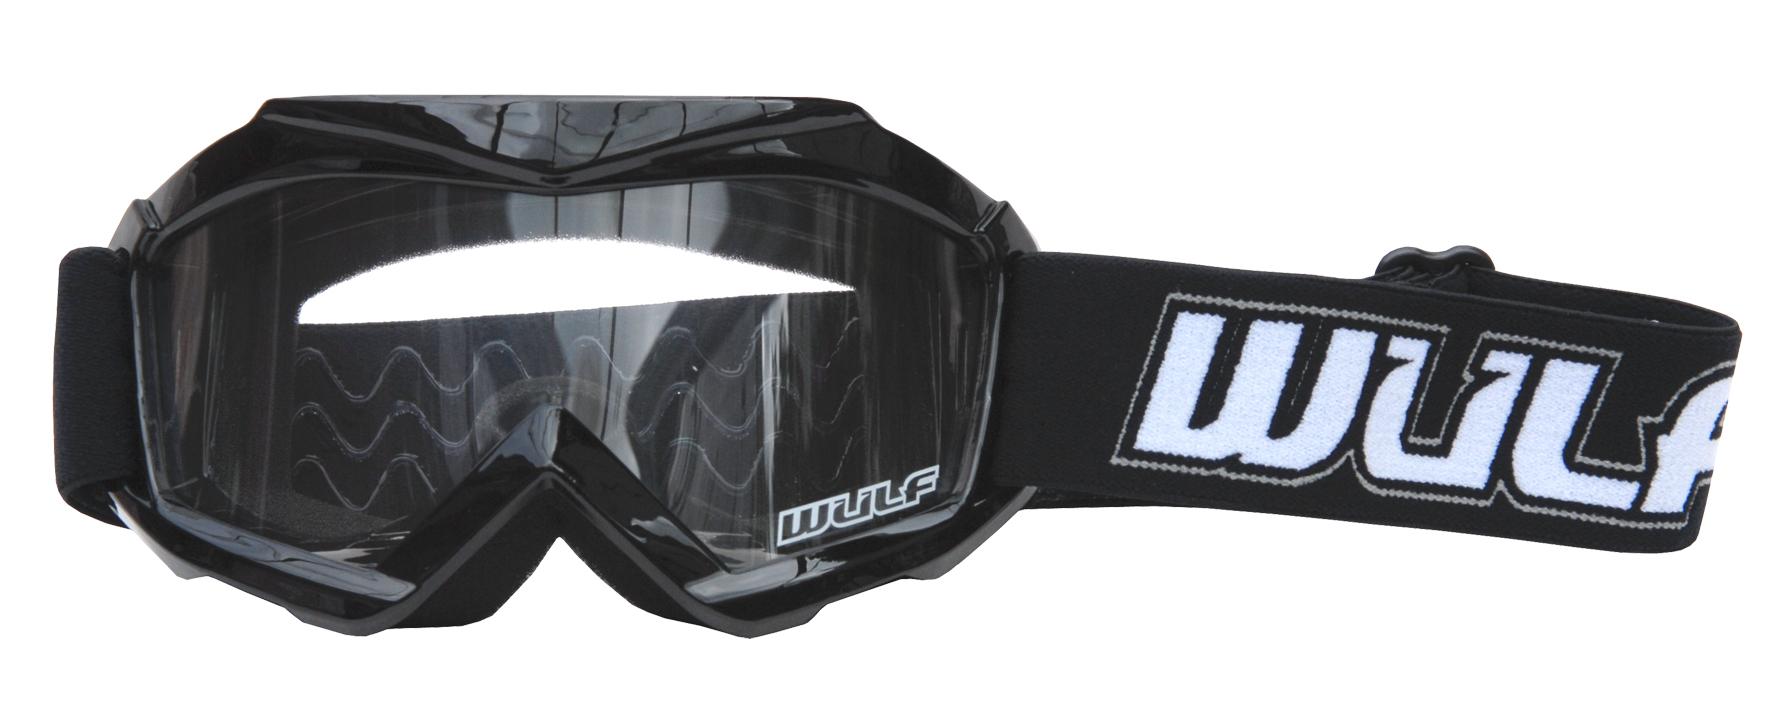 Wulfsport Cub Tech Goggles for MX Enduro - Black